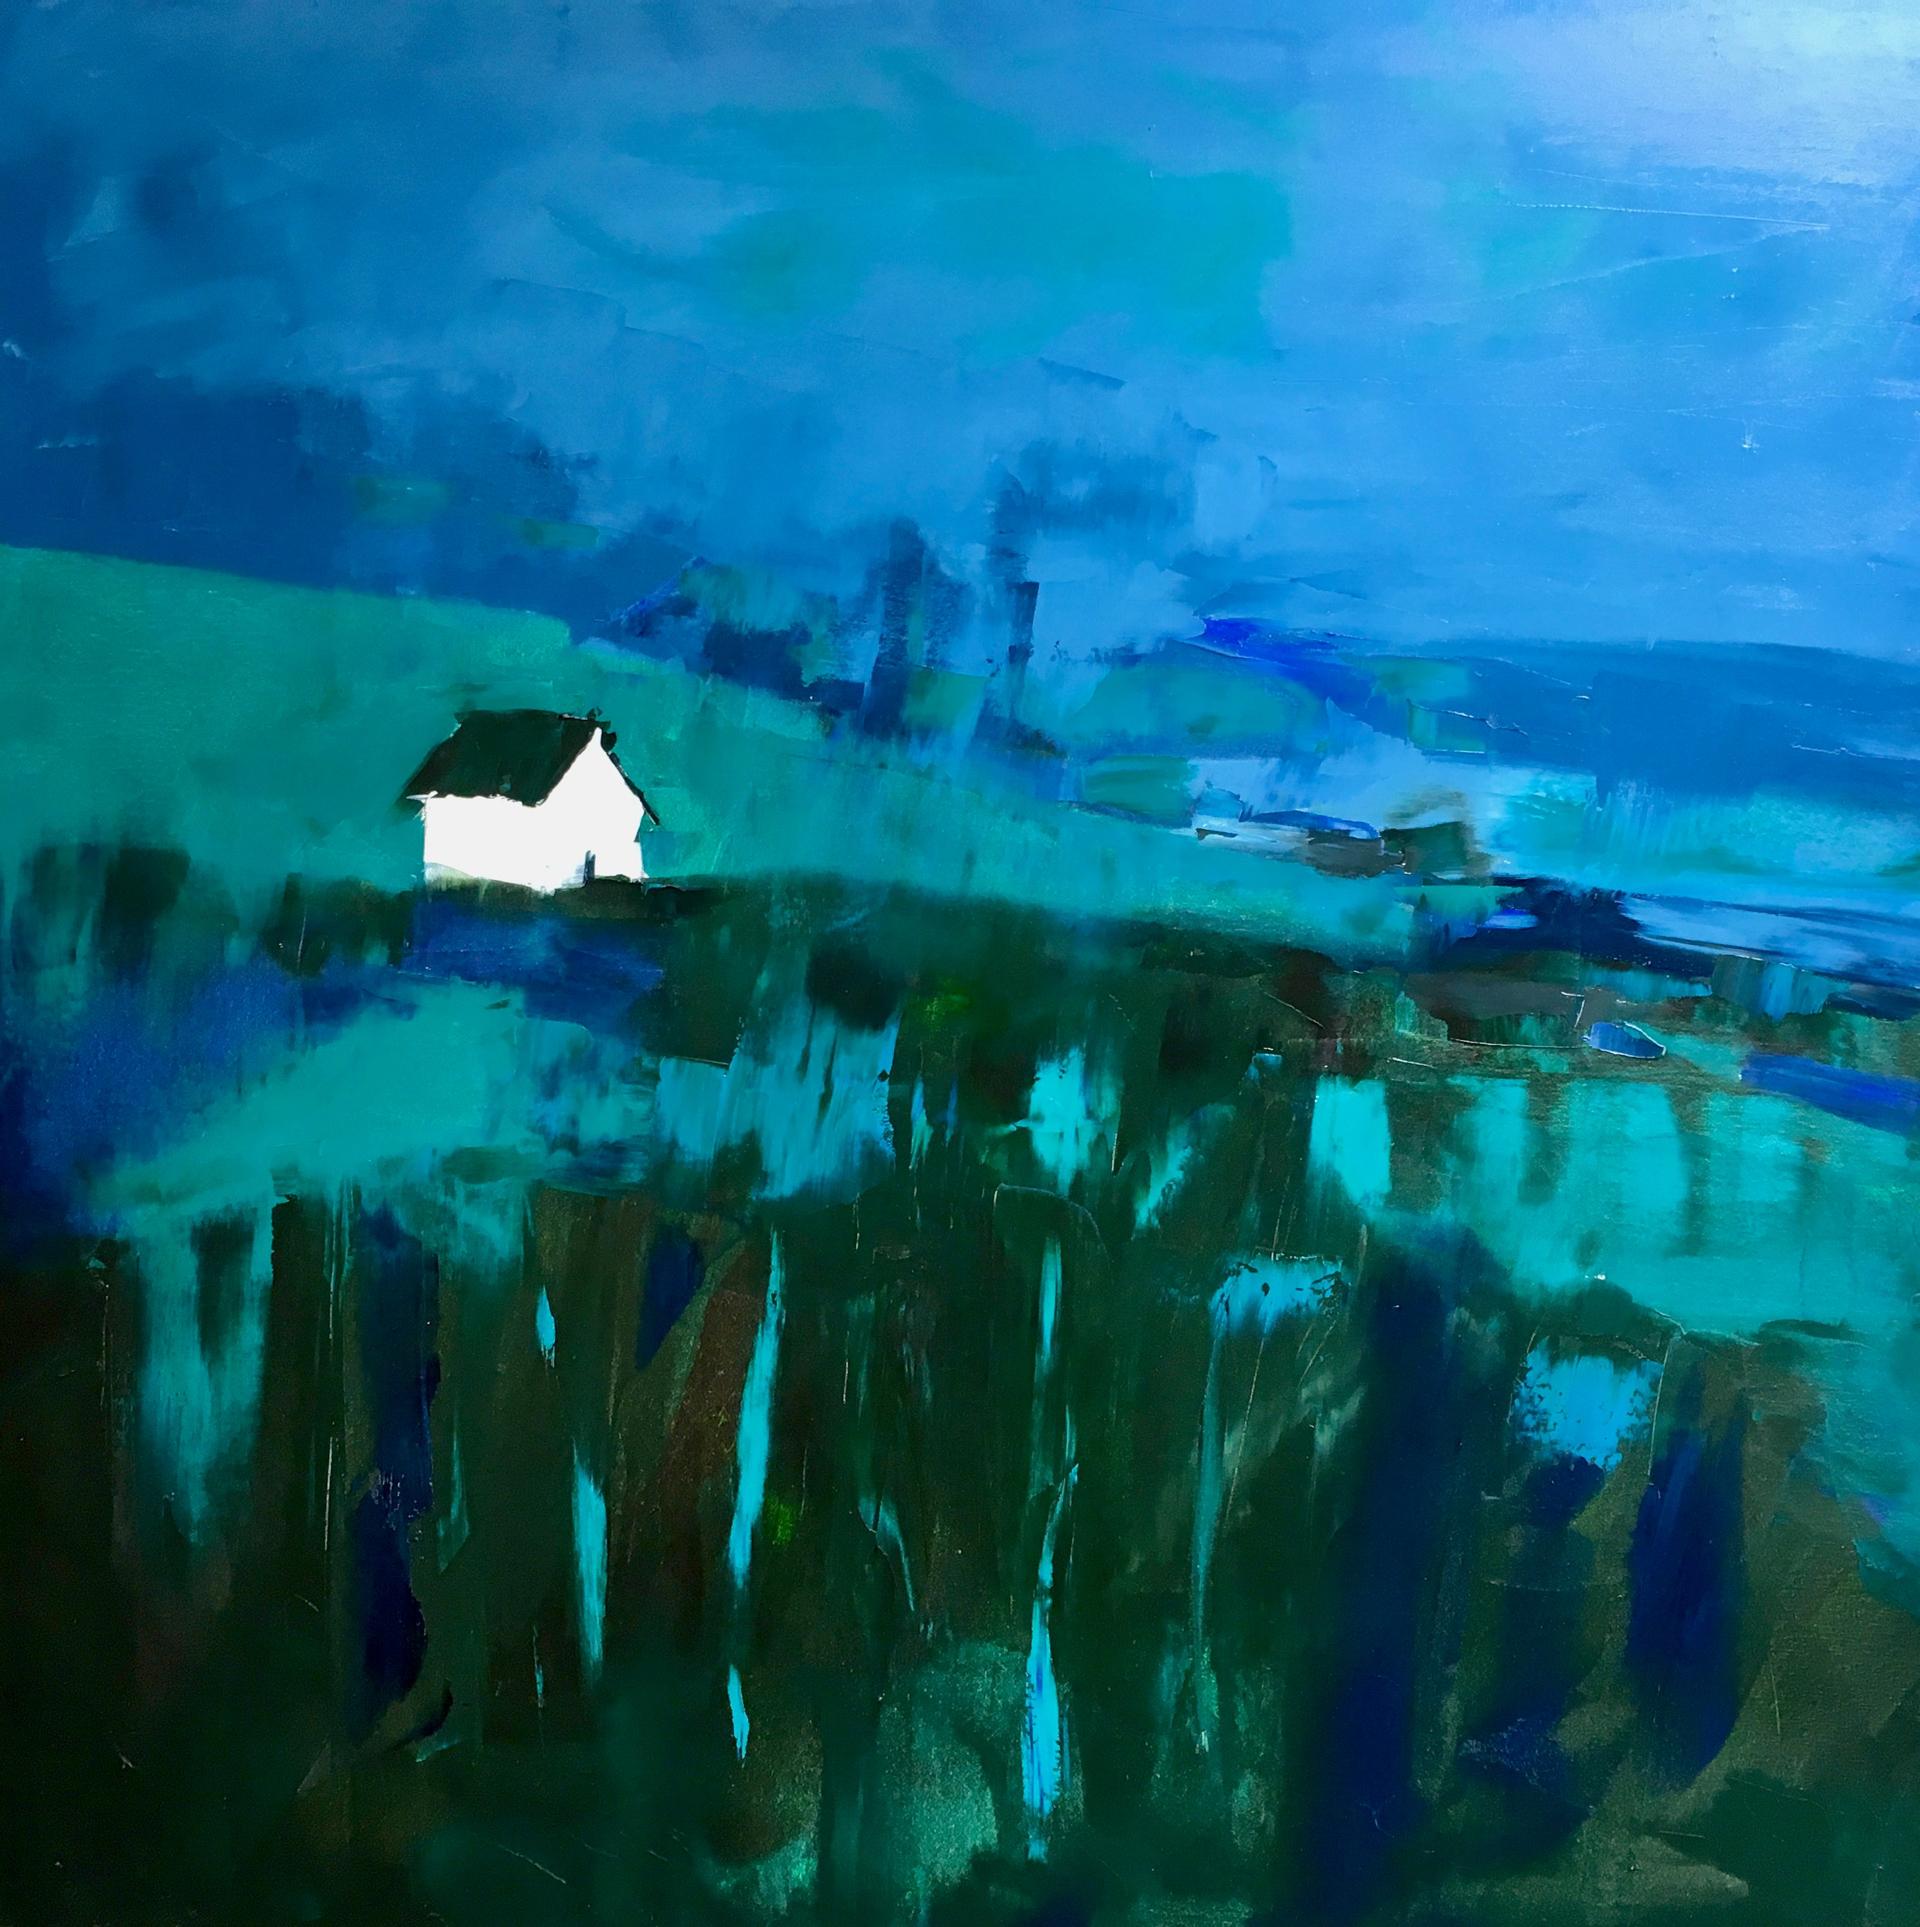 Cobalt Green by Sandra Pratt